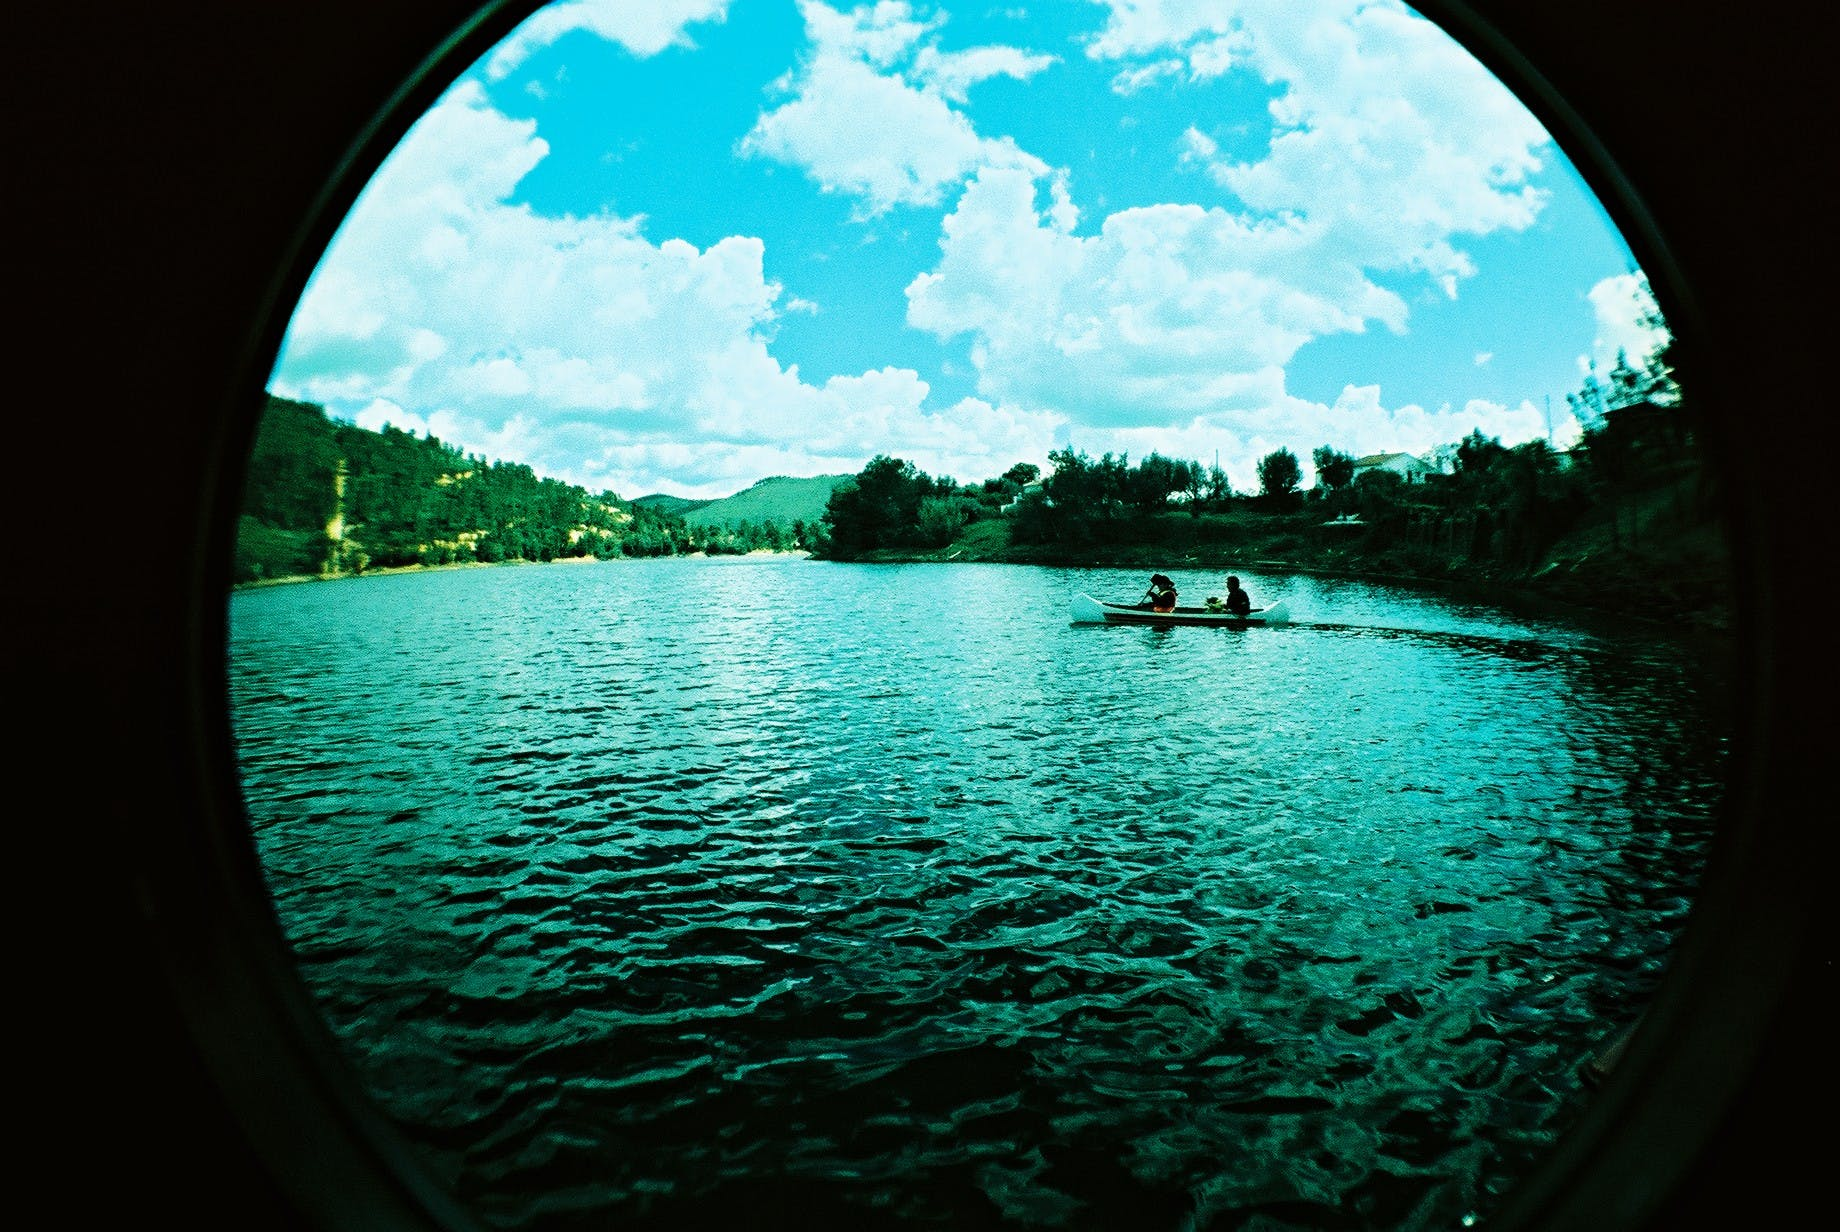 Fisheye Lens Photo of River